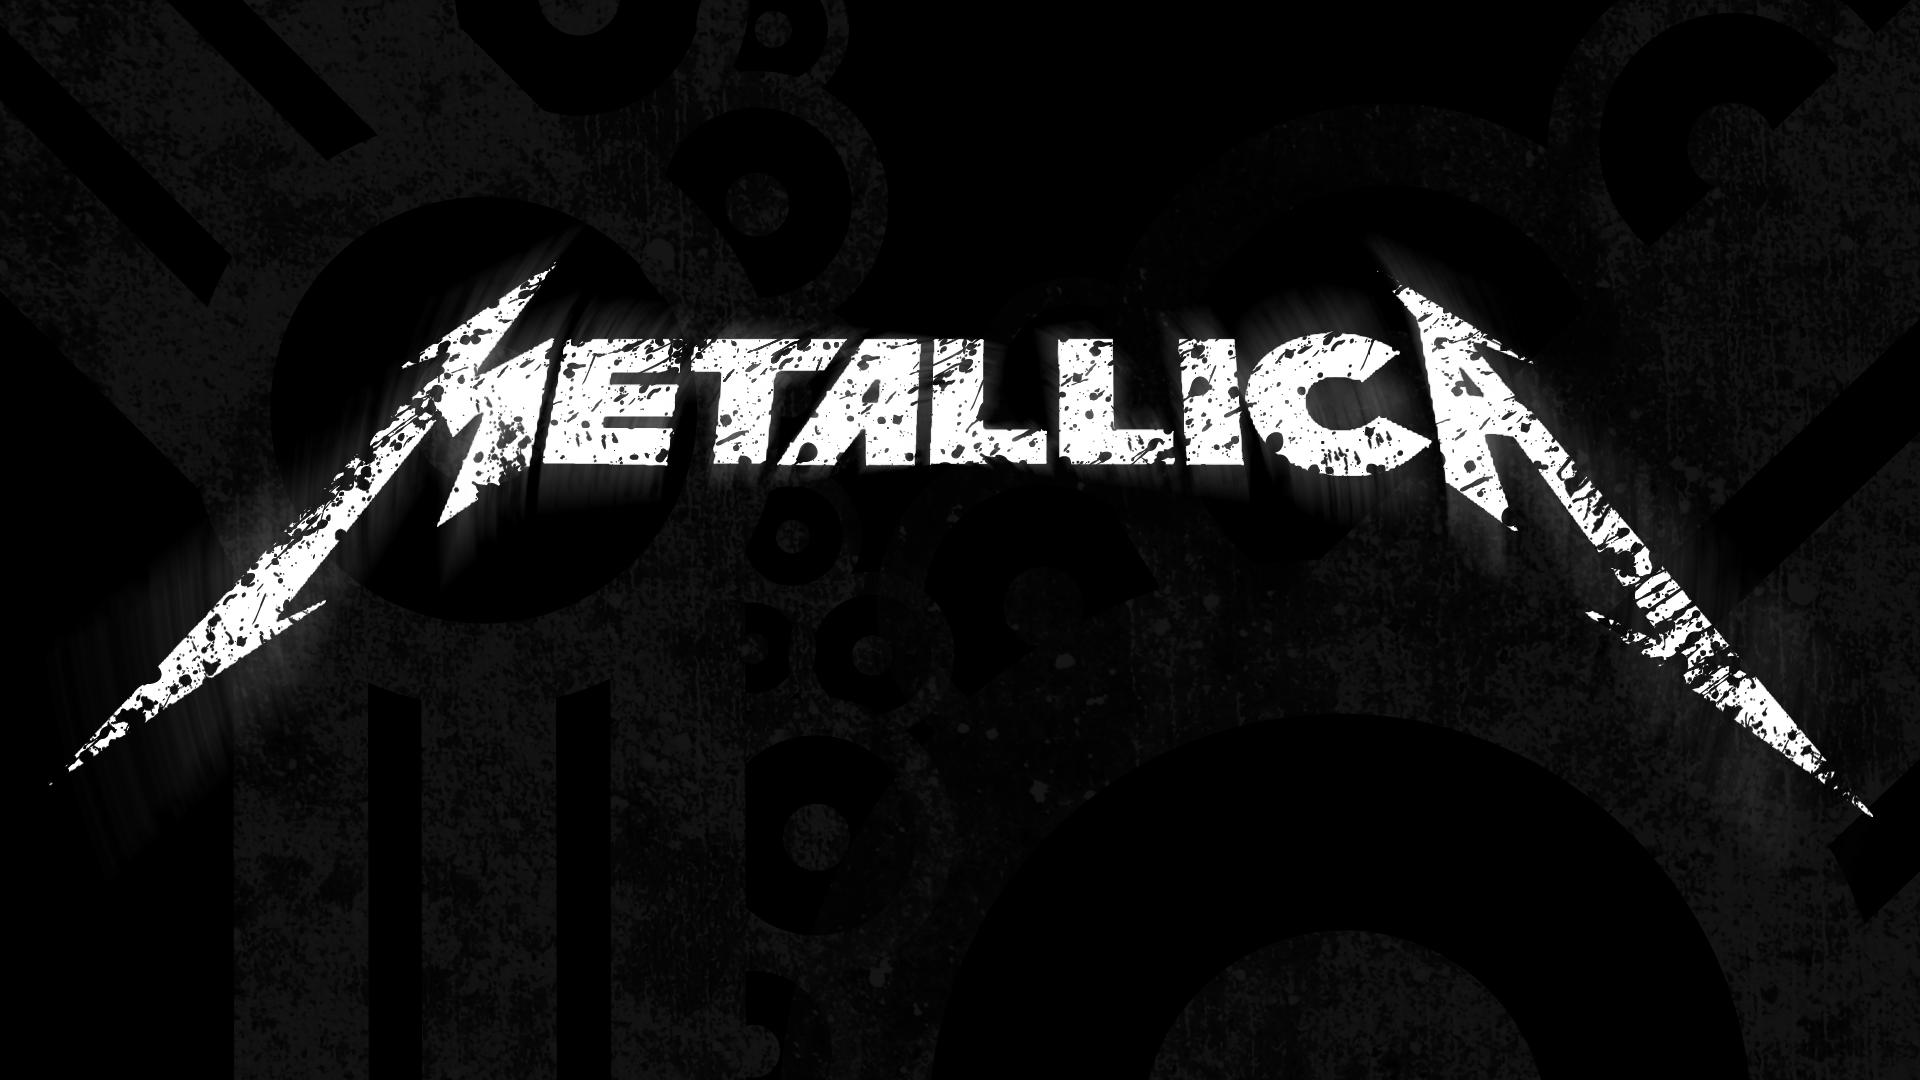 Free Download Metallica Black Album Wallpapers 1920x1080 For Your Desktop Mobile Tablet Explore 95 Metallica 2018 Wallpapers Metallica 2018 Wallpapers Metallica Background Metallica Backgrounds